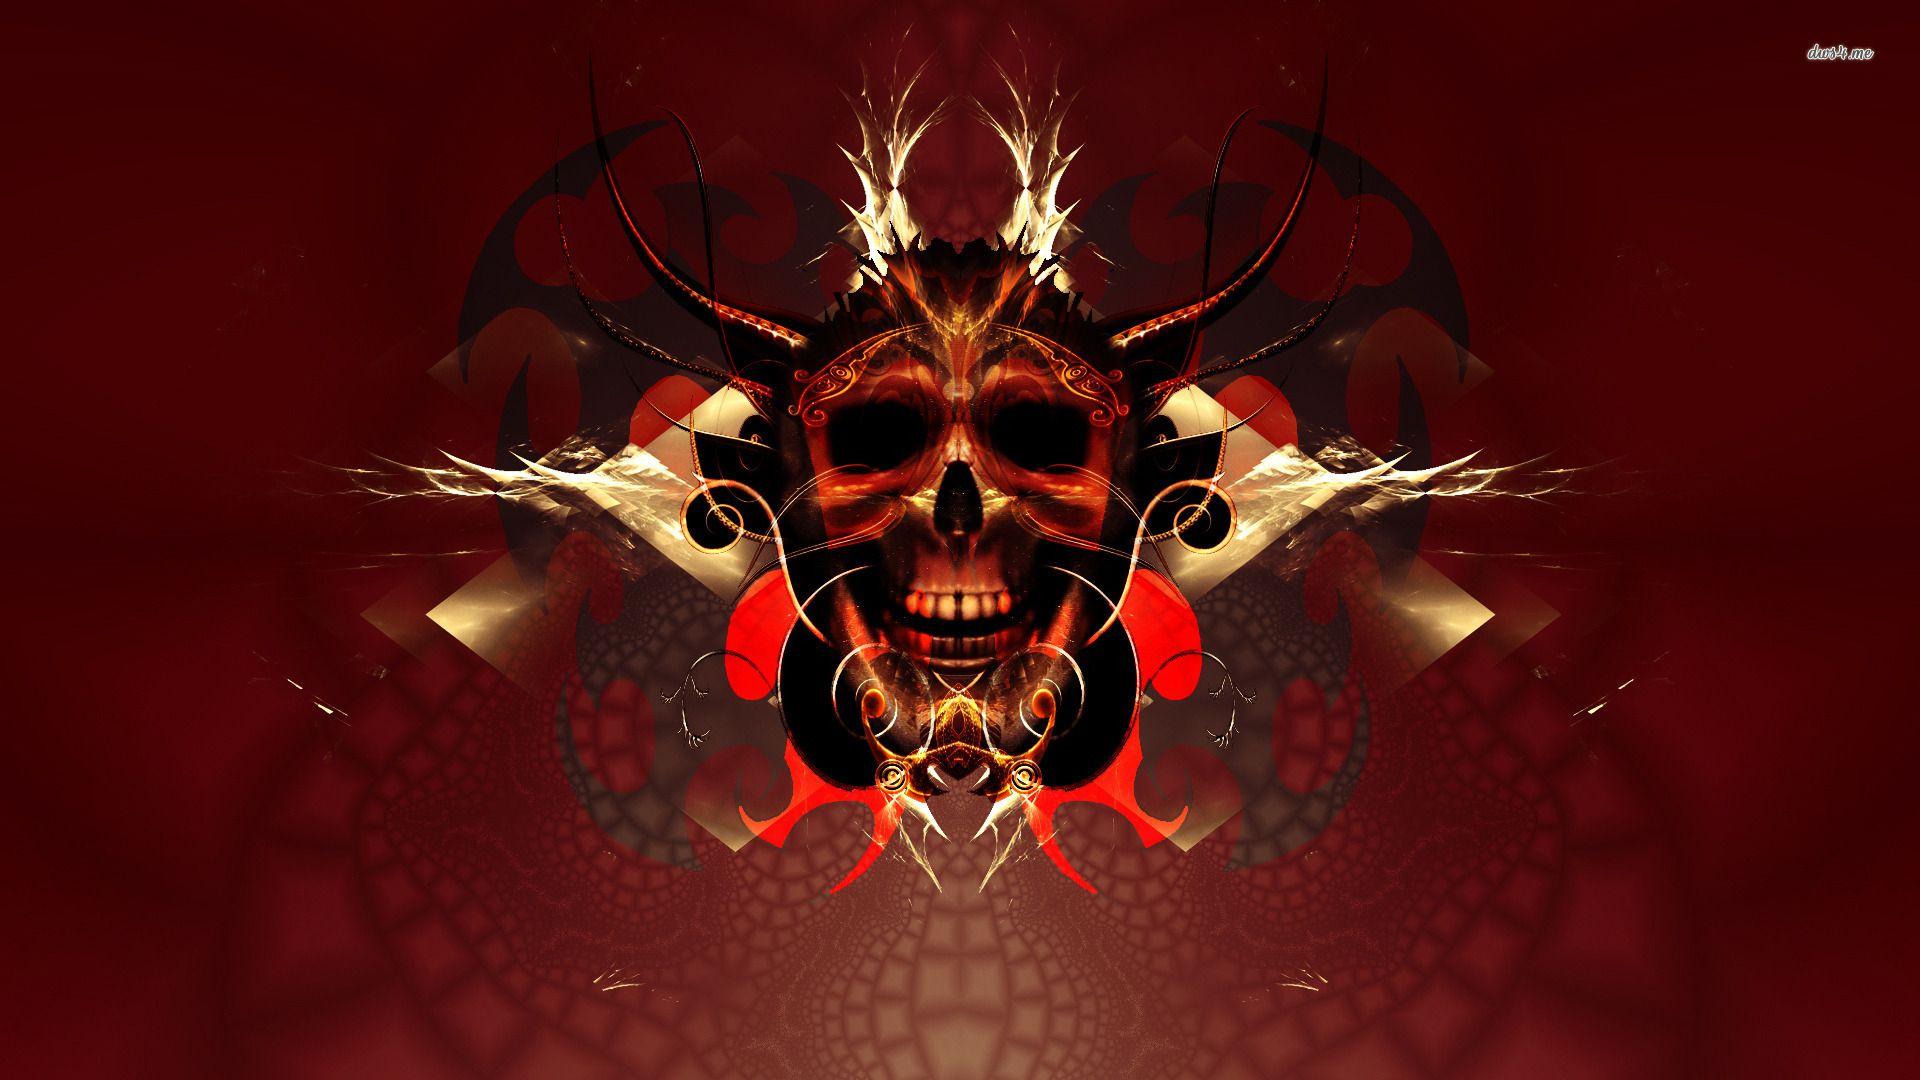 Red Skull Wallpaper Hd Red skull wallpaper hd red | CALAVERAS ...